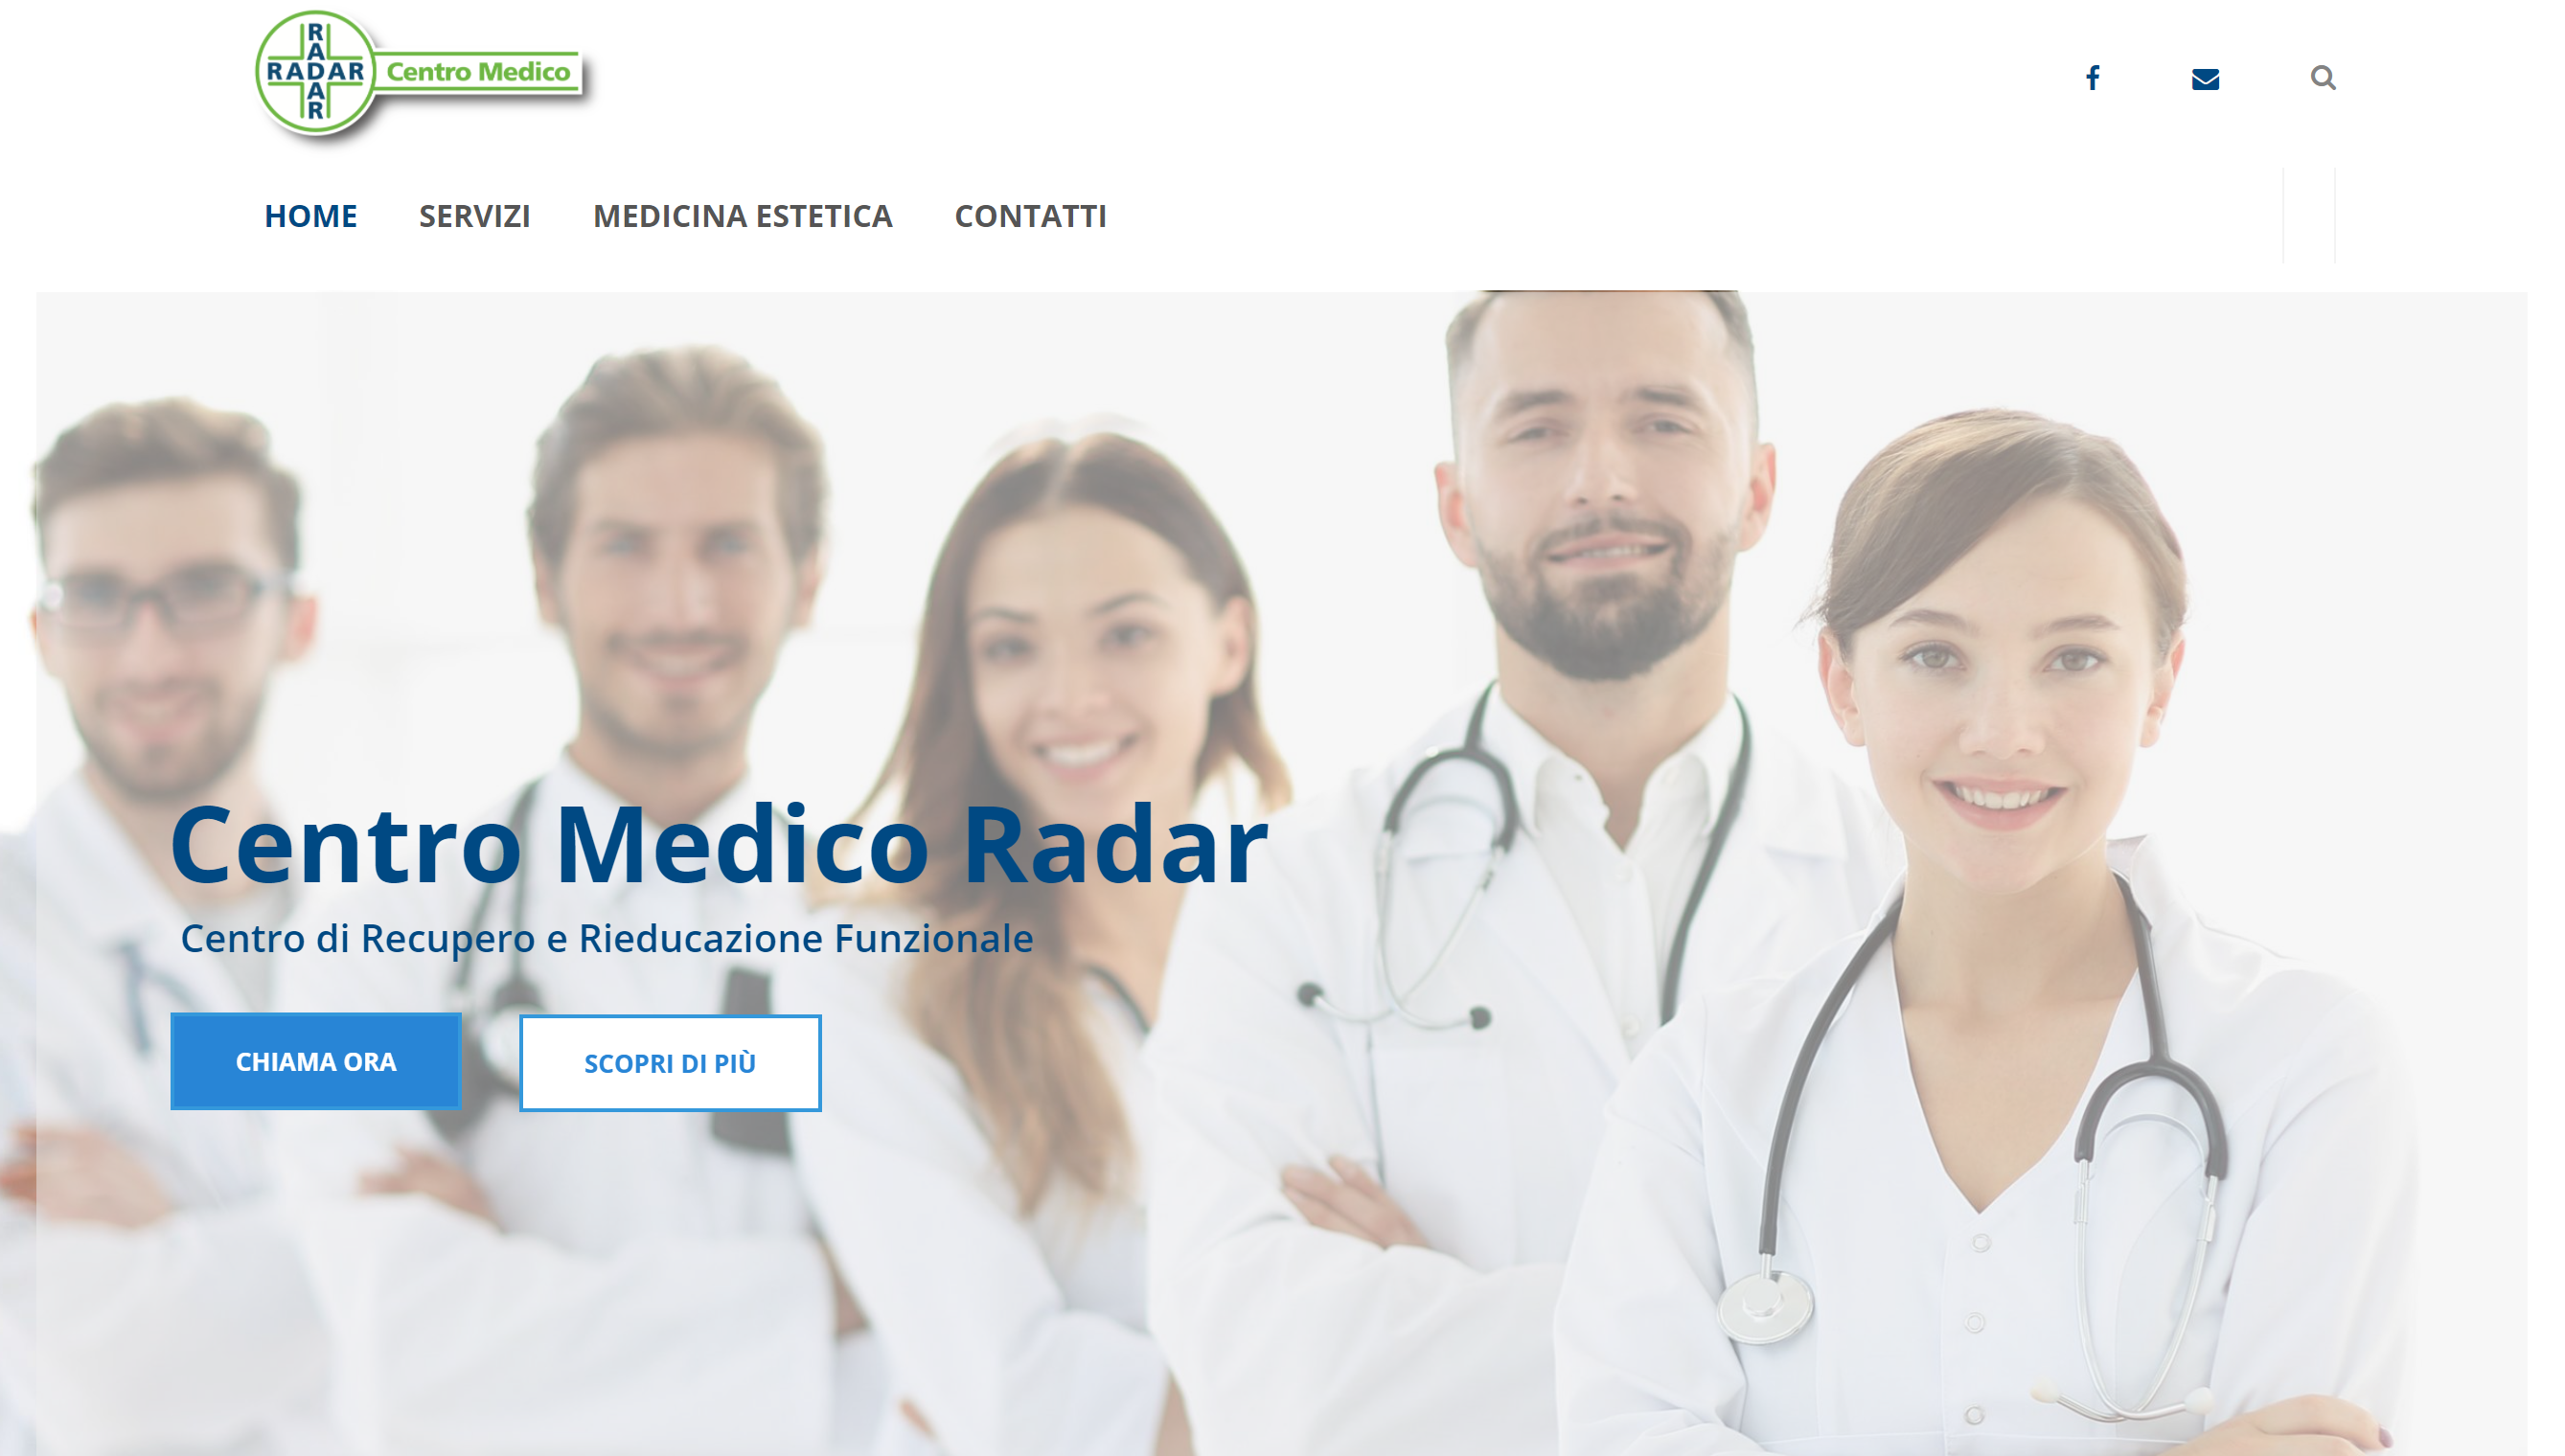 Centro Medico Radar